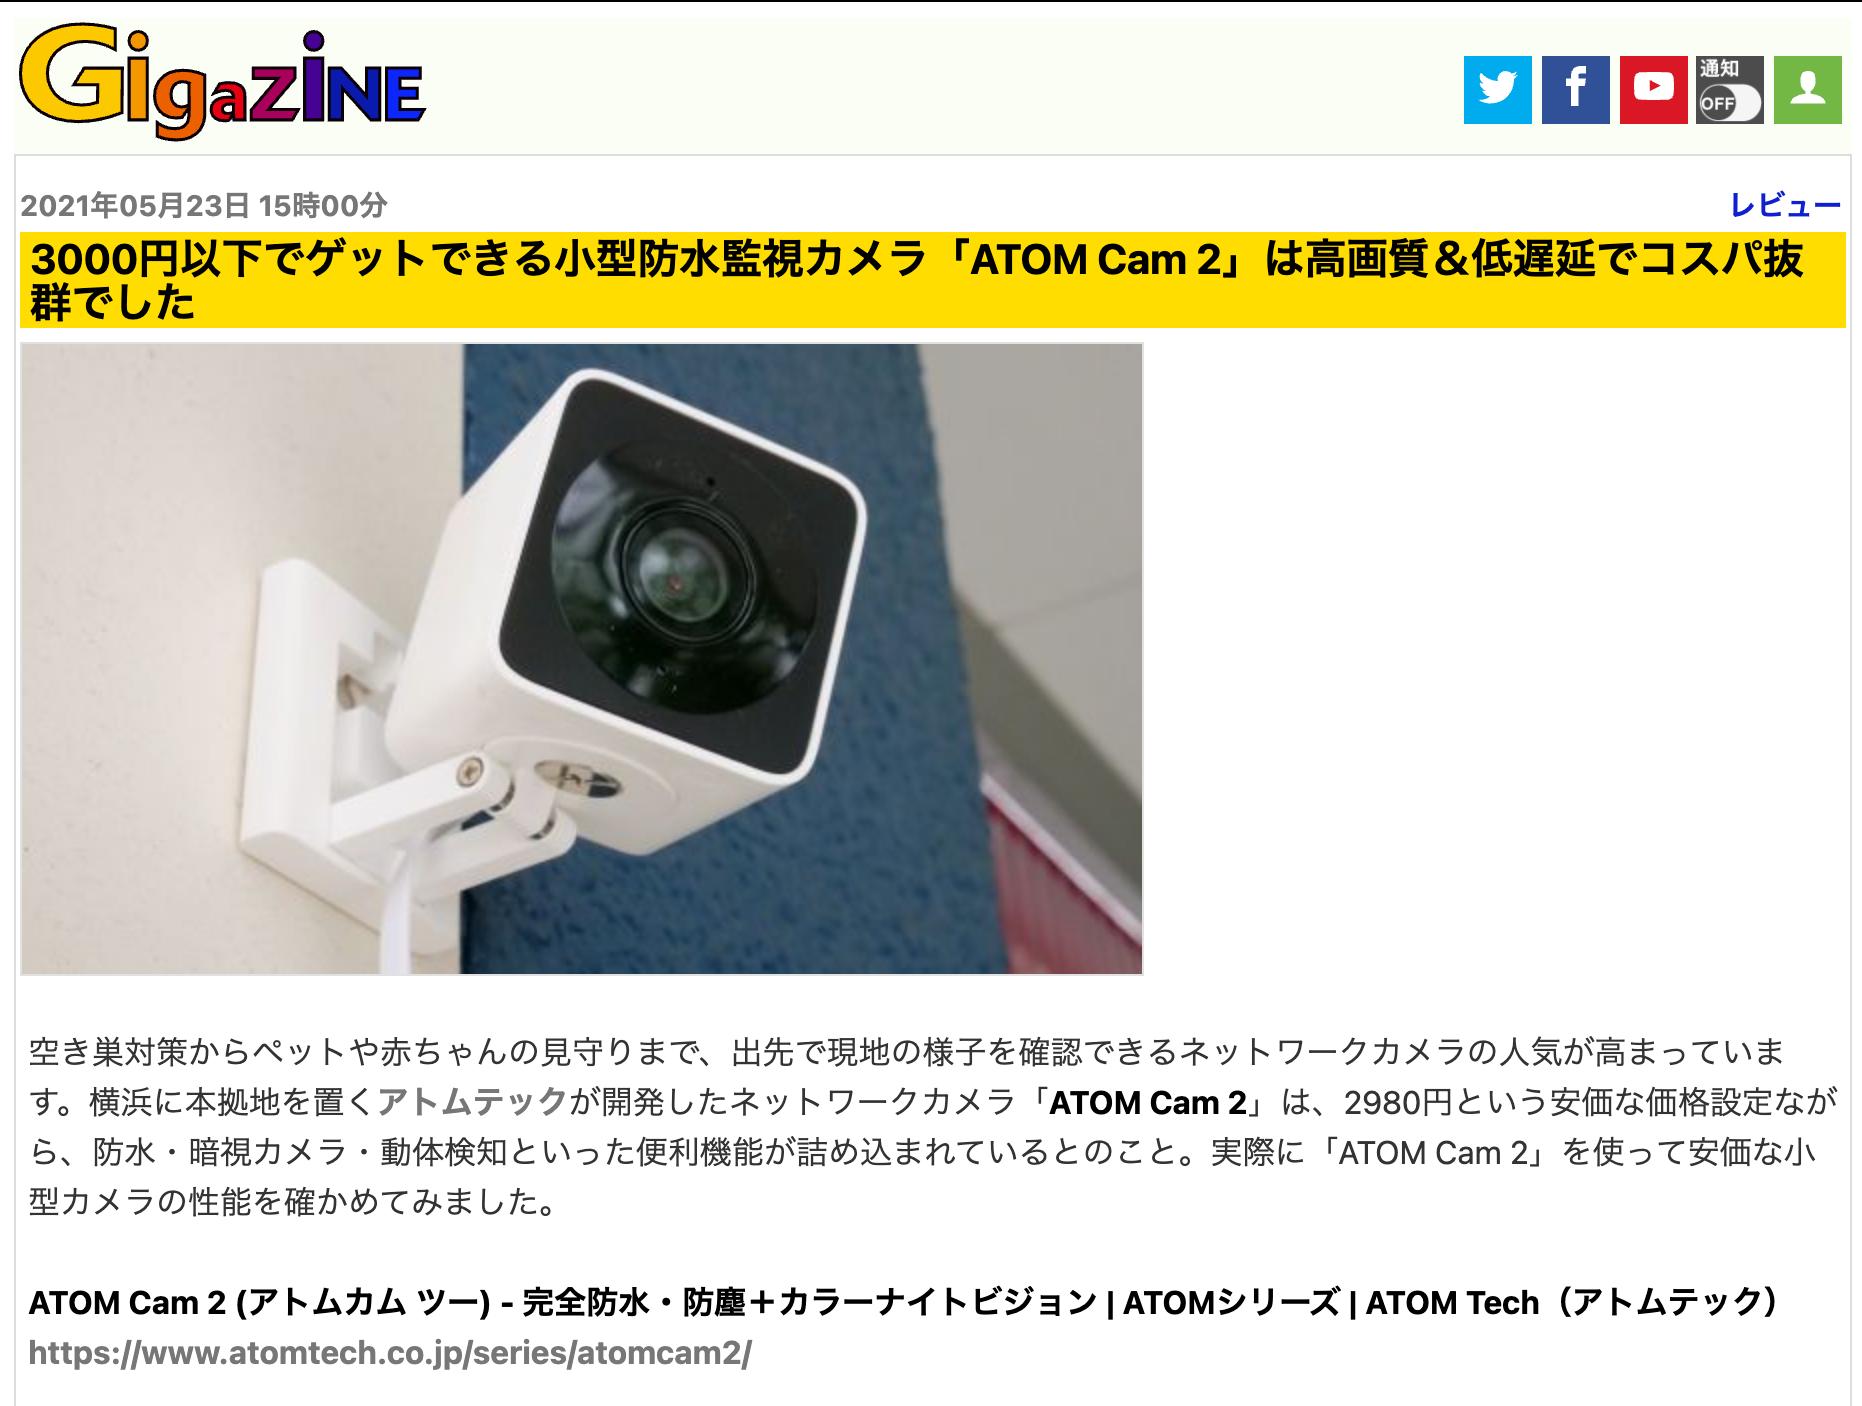 GigazineにATOM Cam 2について掲載していただきました